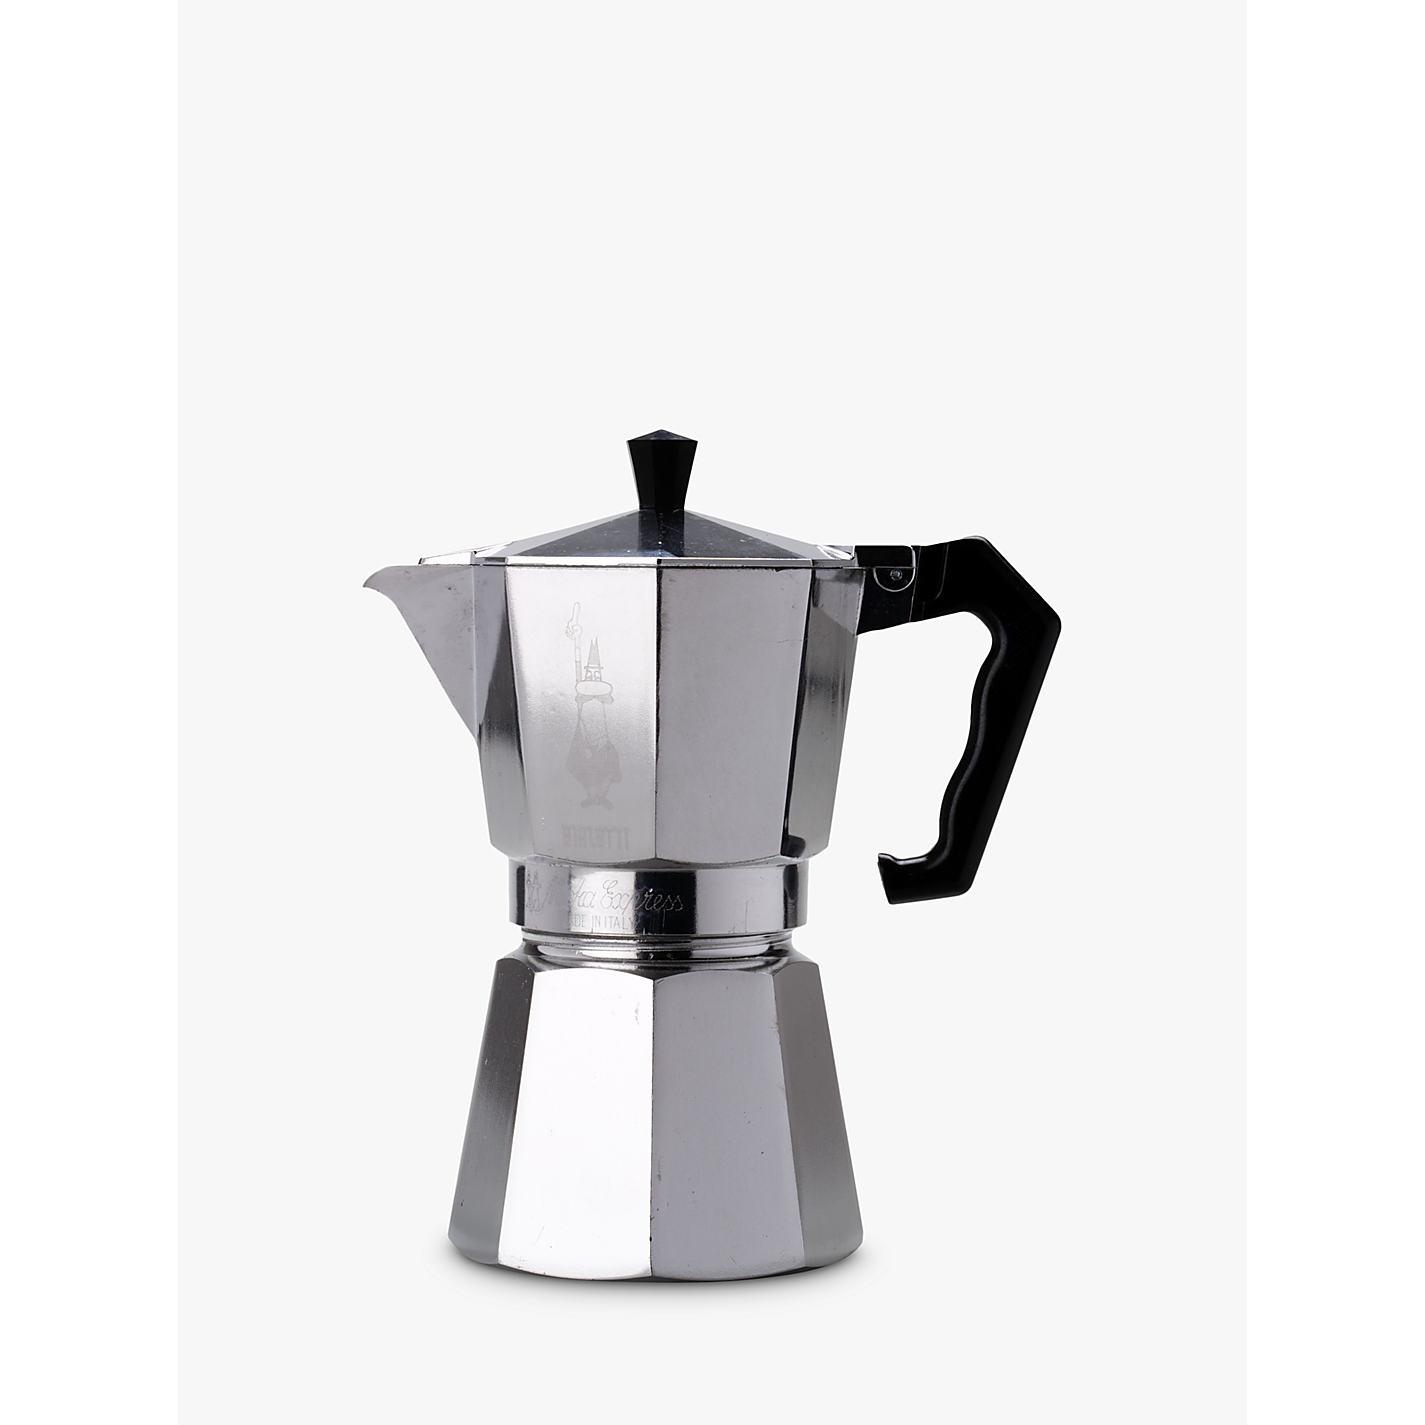 Bialetti Moka Express Hob Espresso Maker Online At Johnlewis